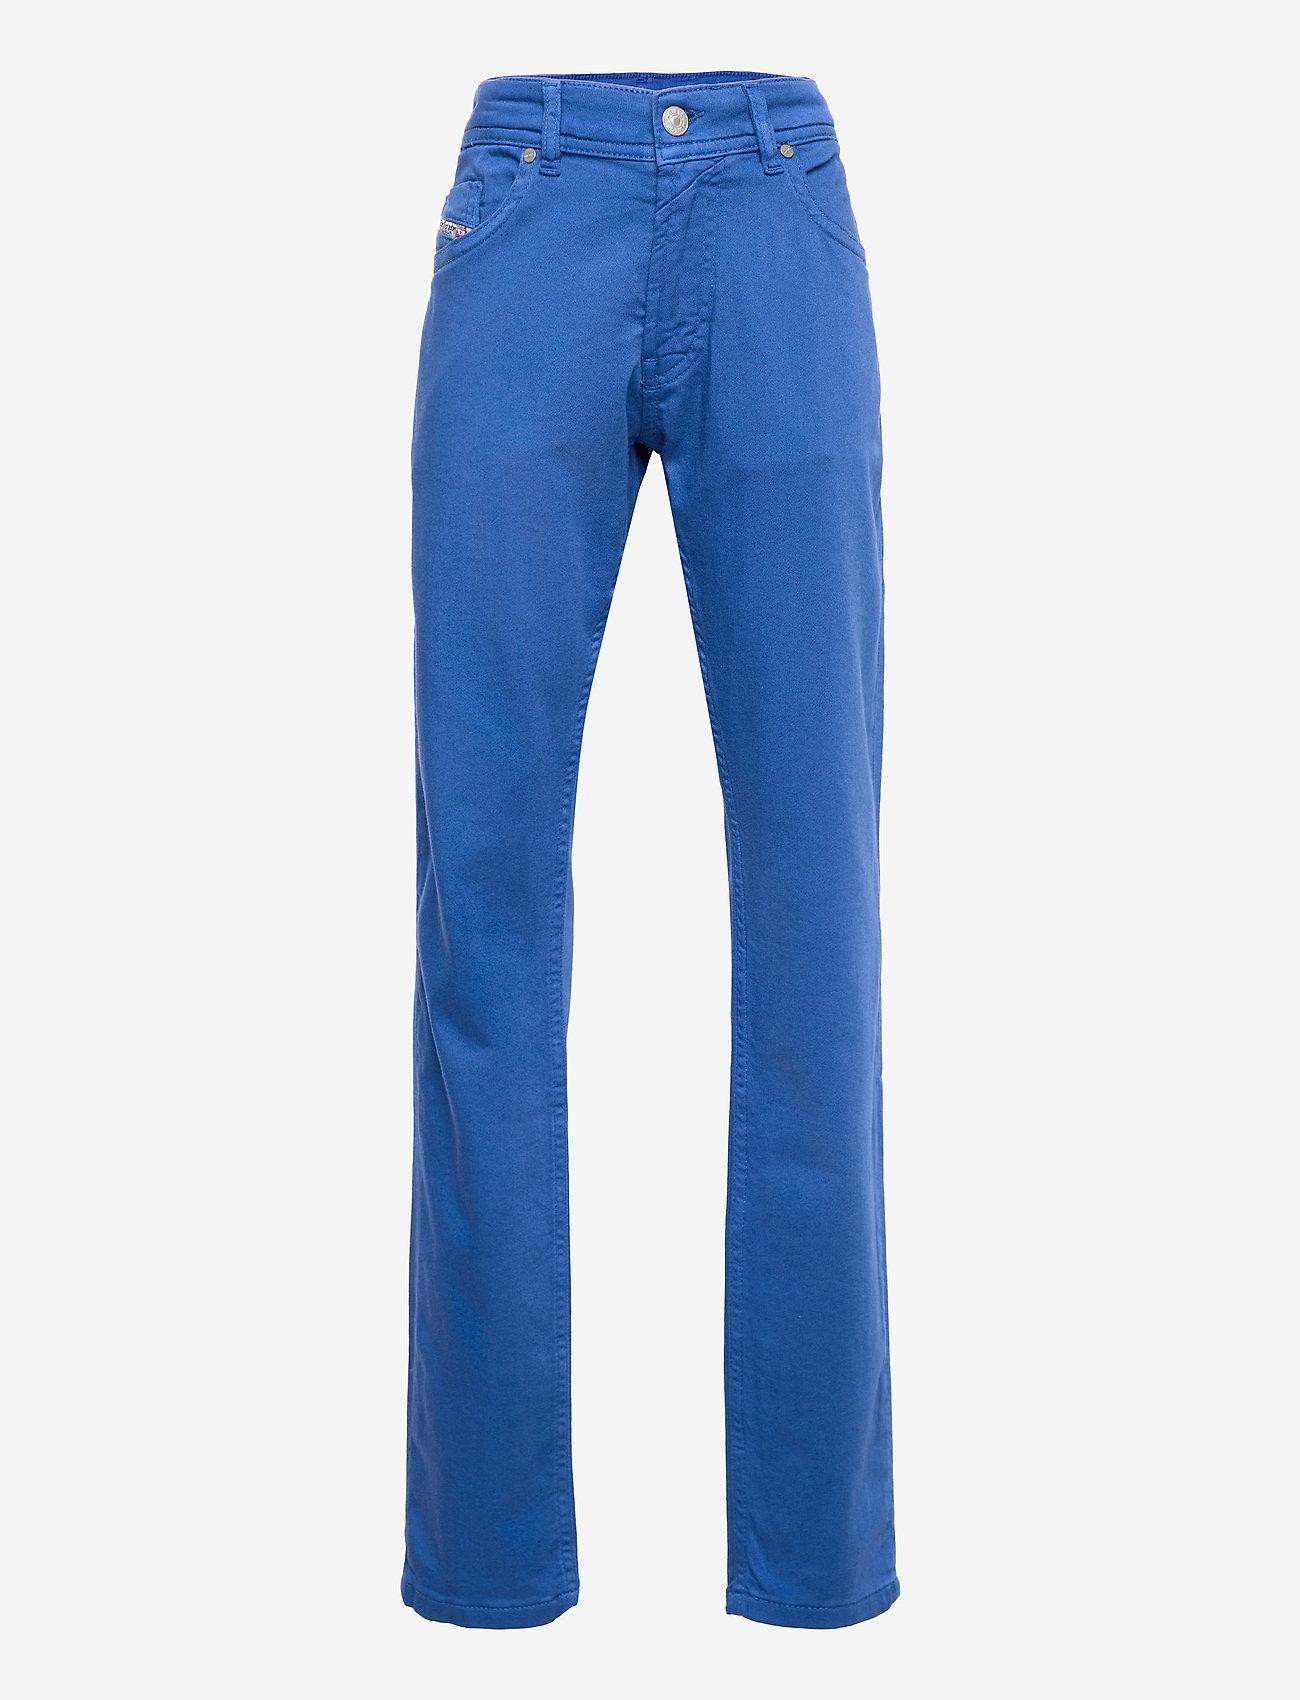 Diesel - THOMMER-J JJJ TROUSERS - jeans - classic bluette - 0